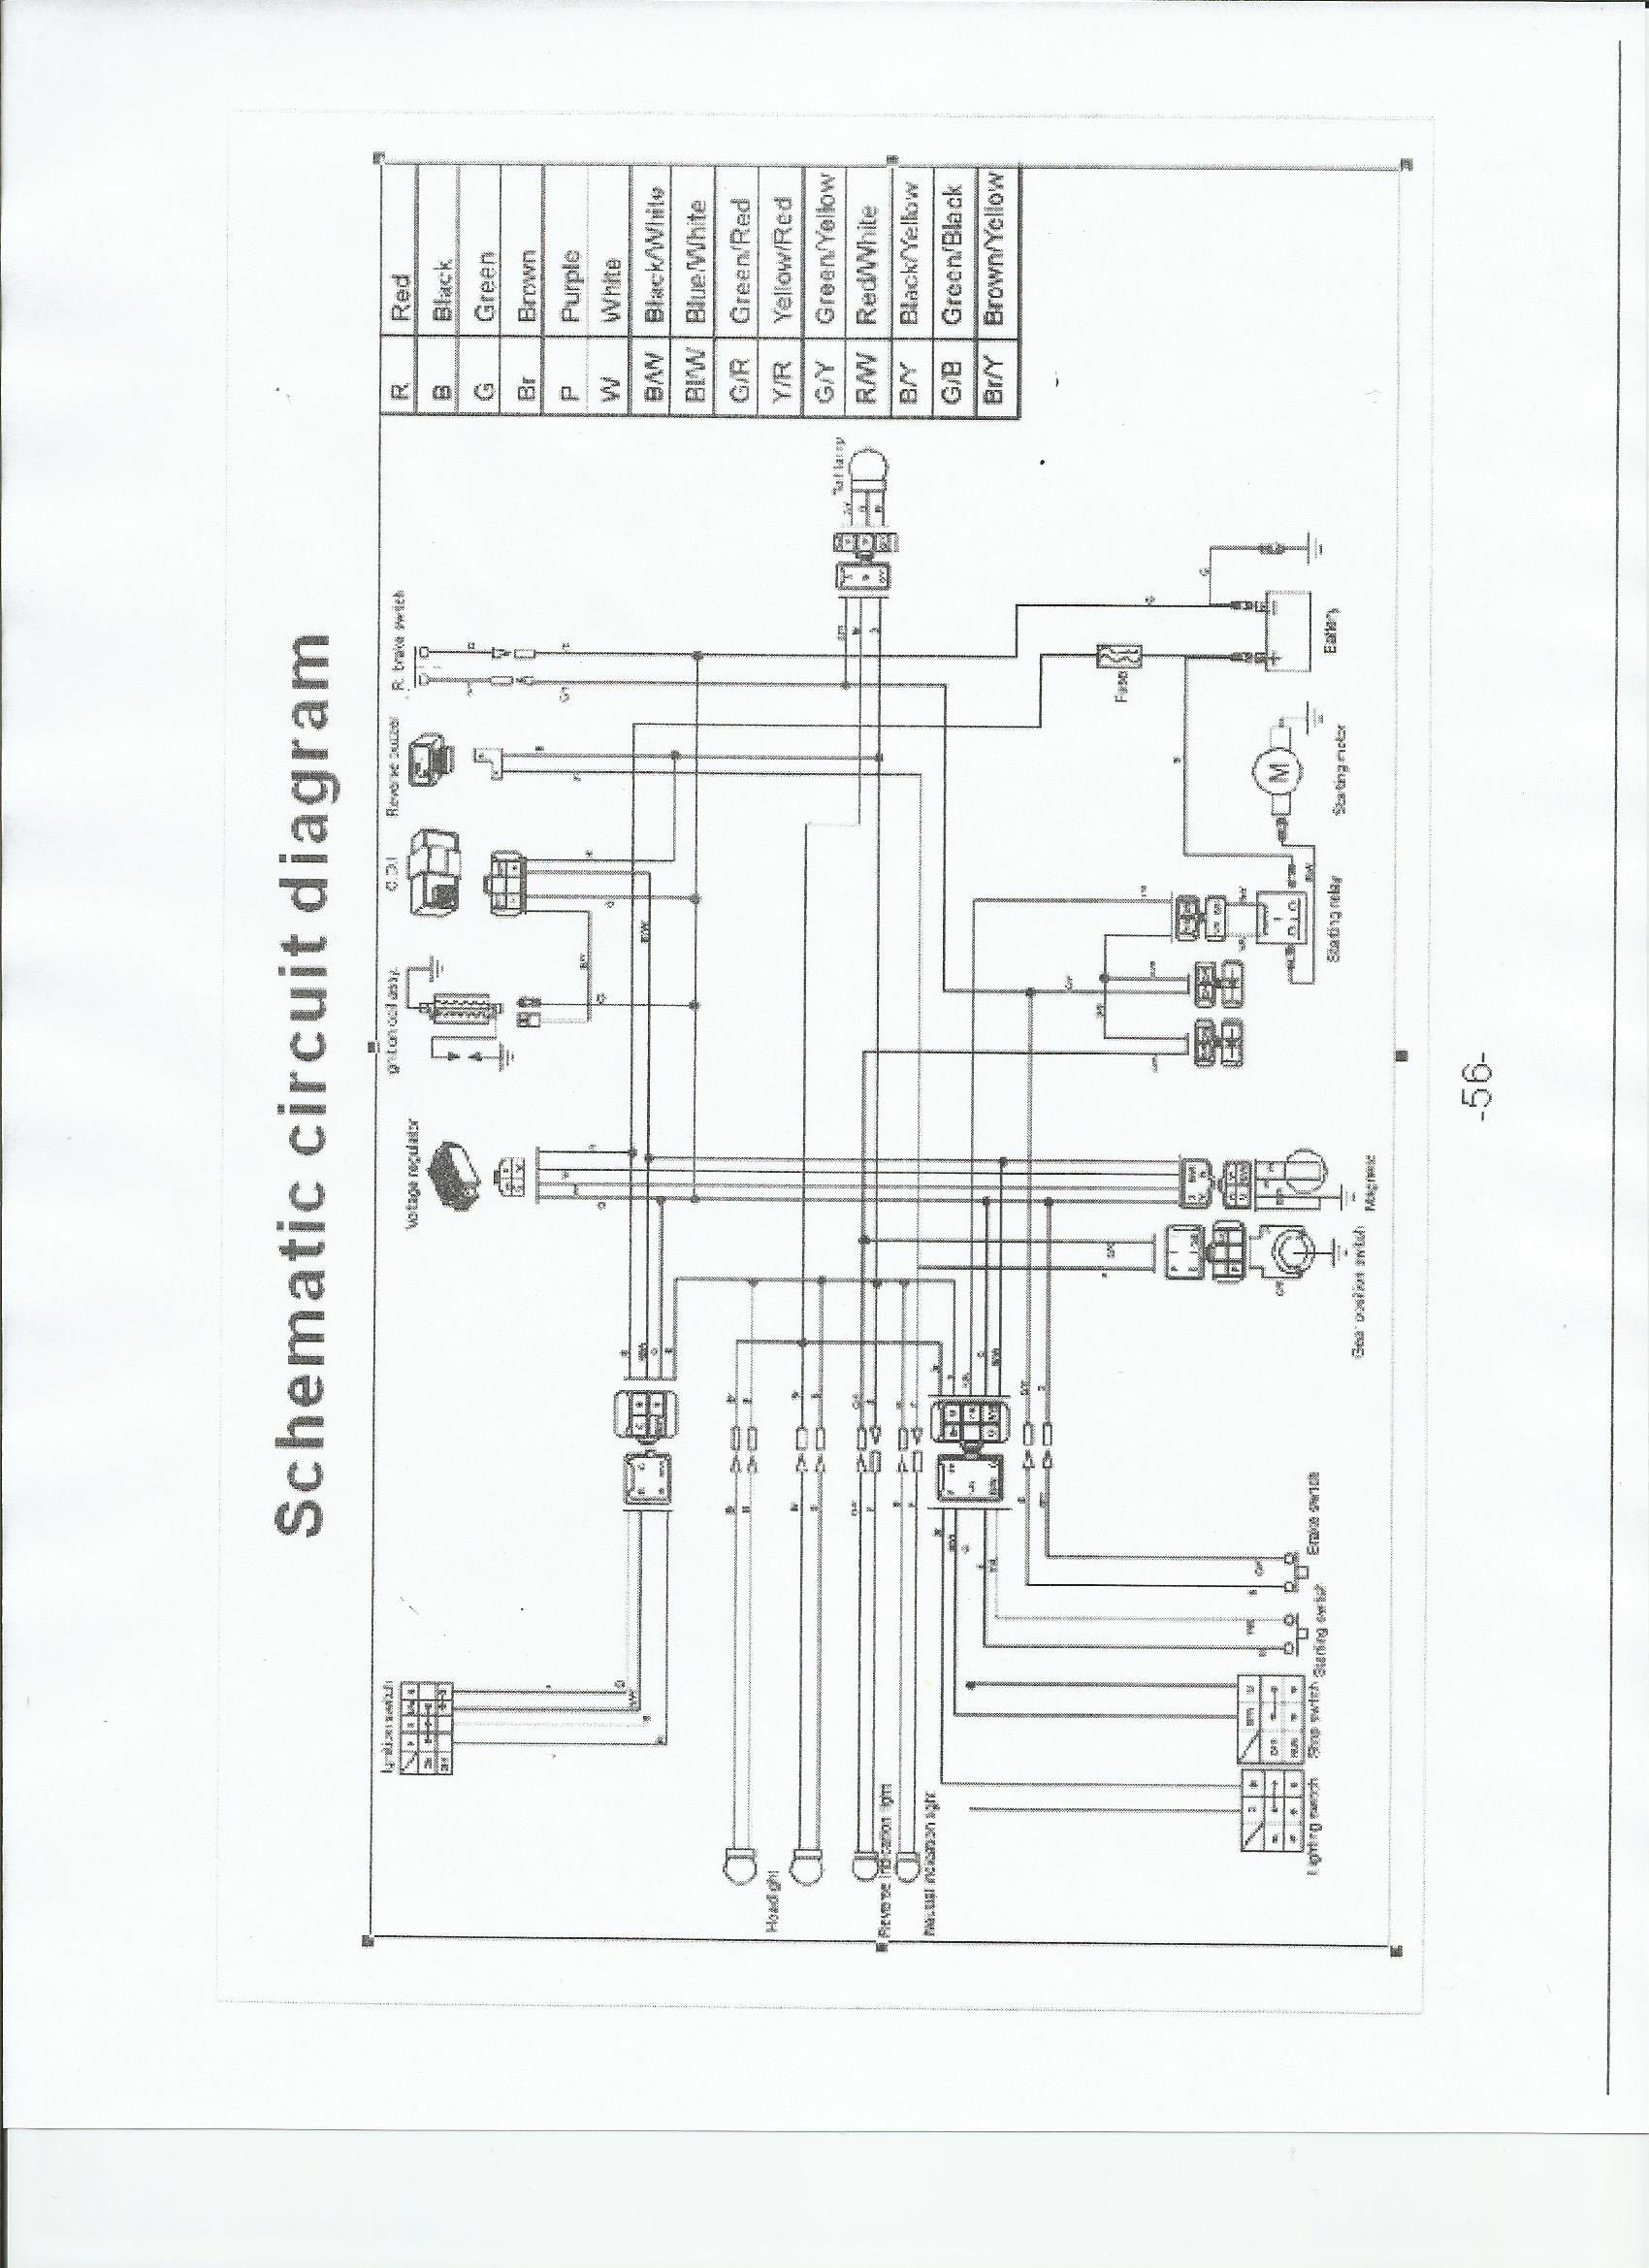 rascal 600 scooter wiring diagram best wiring librarychinese scooter tao wiring diagram wiring diagramstao tao wiring [ 1700 x 2338 Pixel ]